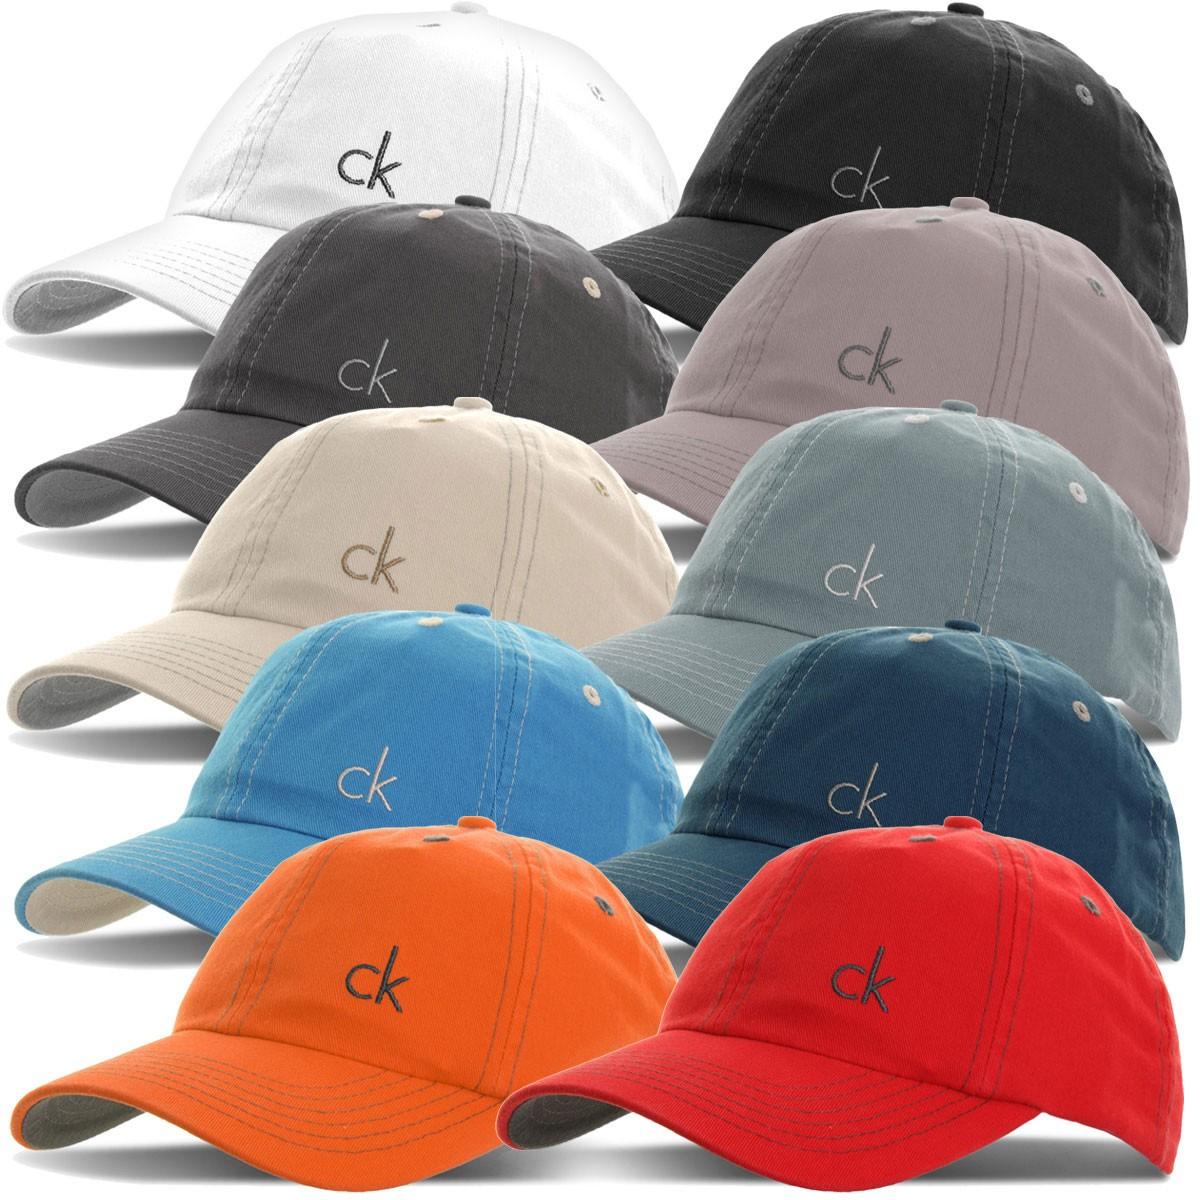 73473f2c6cb Calvin Klein Mens CK Vintage Twill Baseball Golf Cap - One Size ...